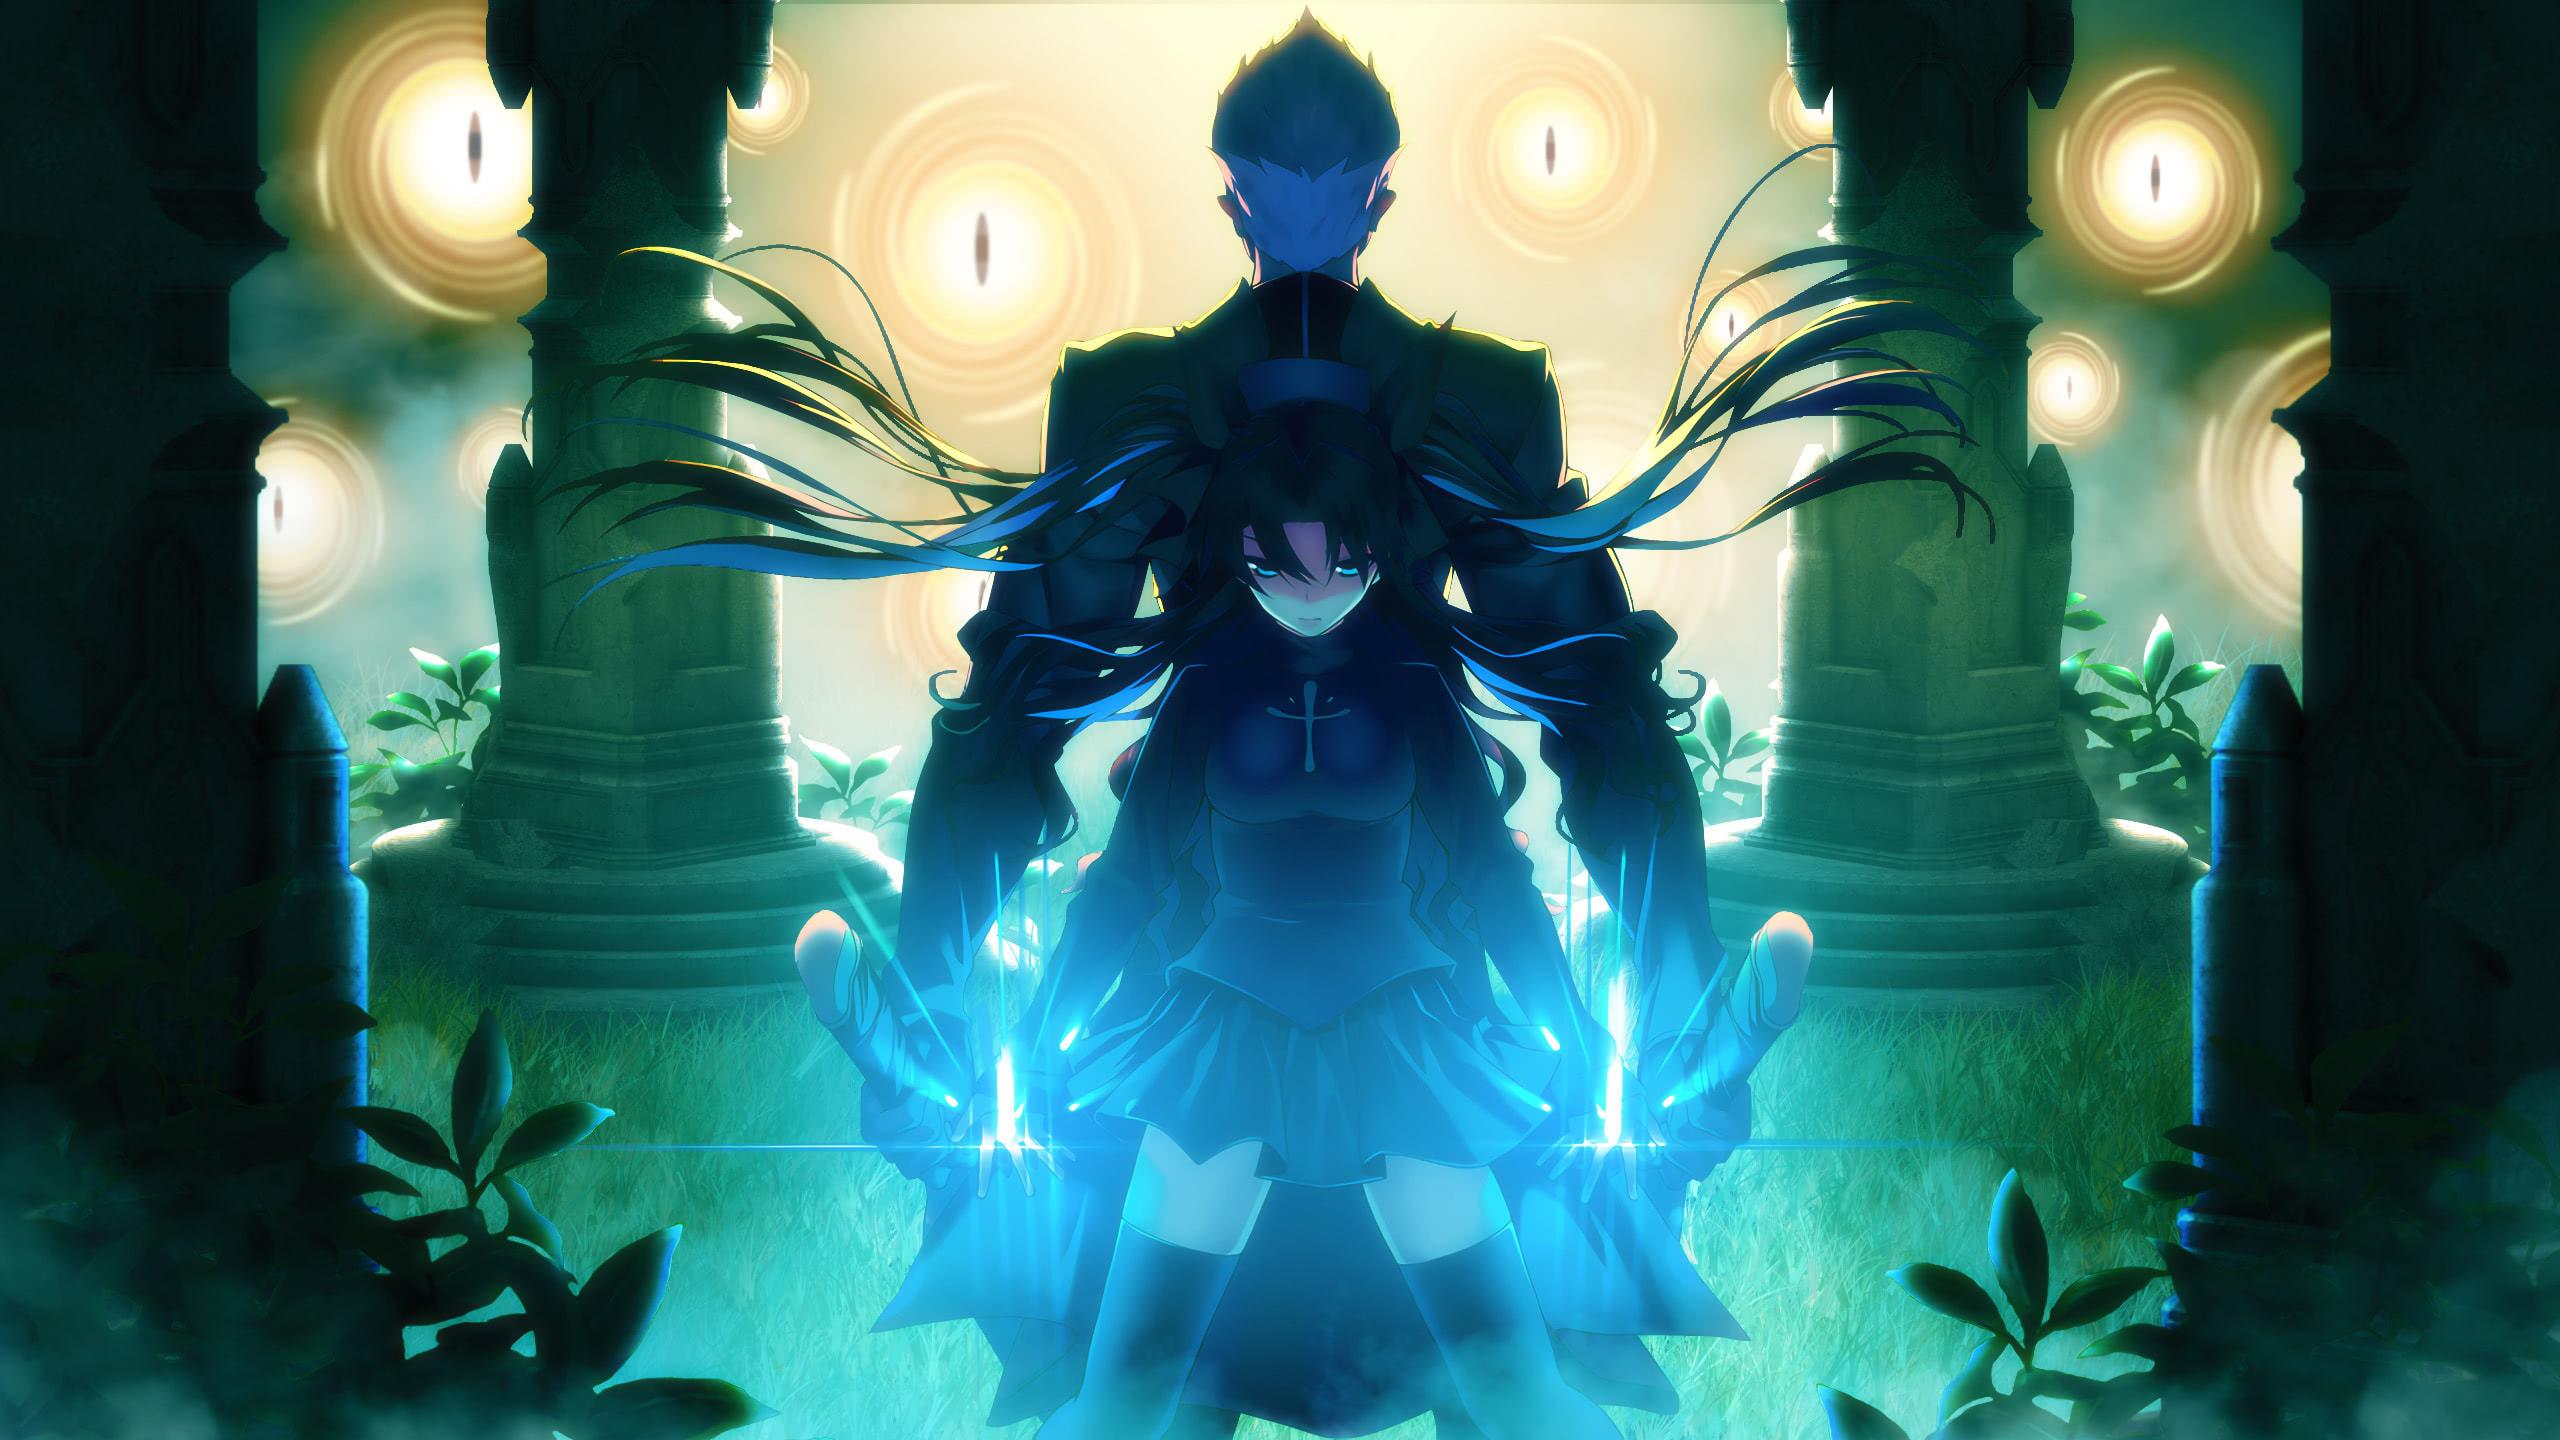 Fate Stay Night Unlimited Blade Works Rin Tohsaka Shirou Fate Stay Night Emiya Background 2560x1440 Wallpaper Teahub Io